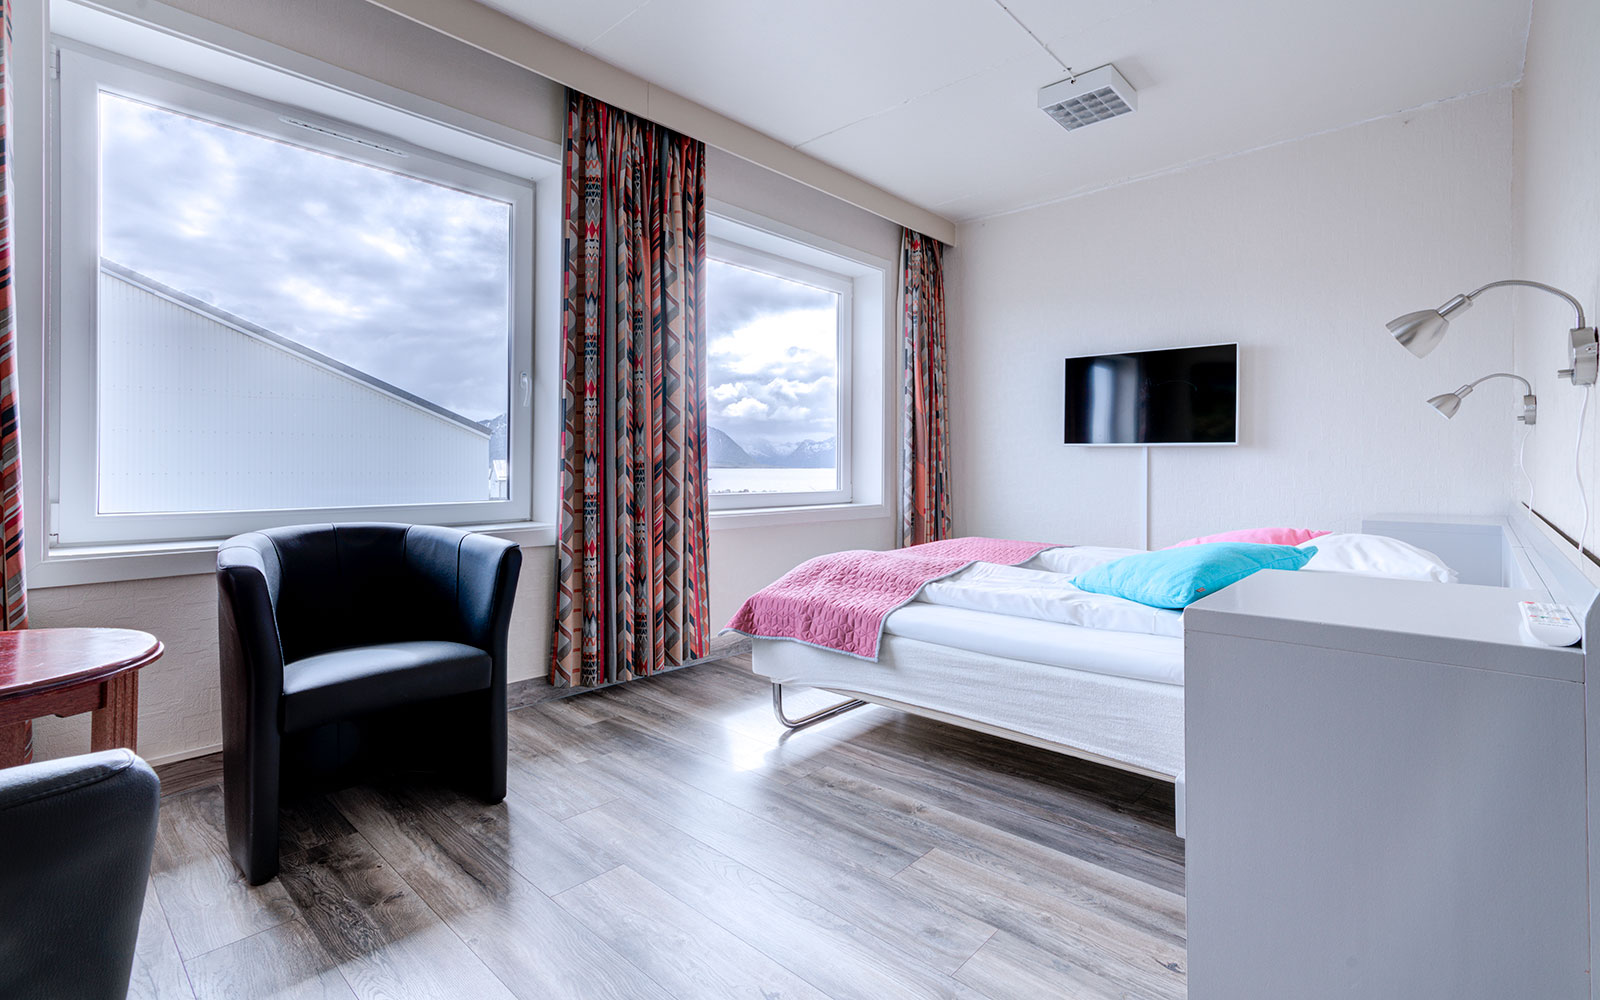 Standard dobbeltrom - Melbu Hotell